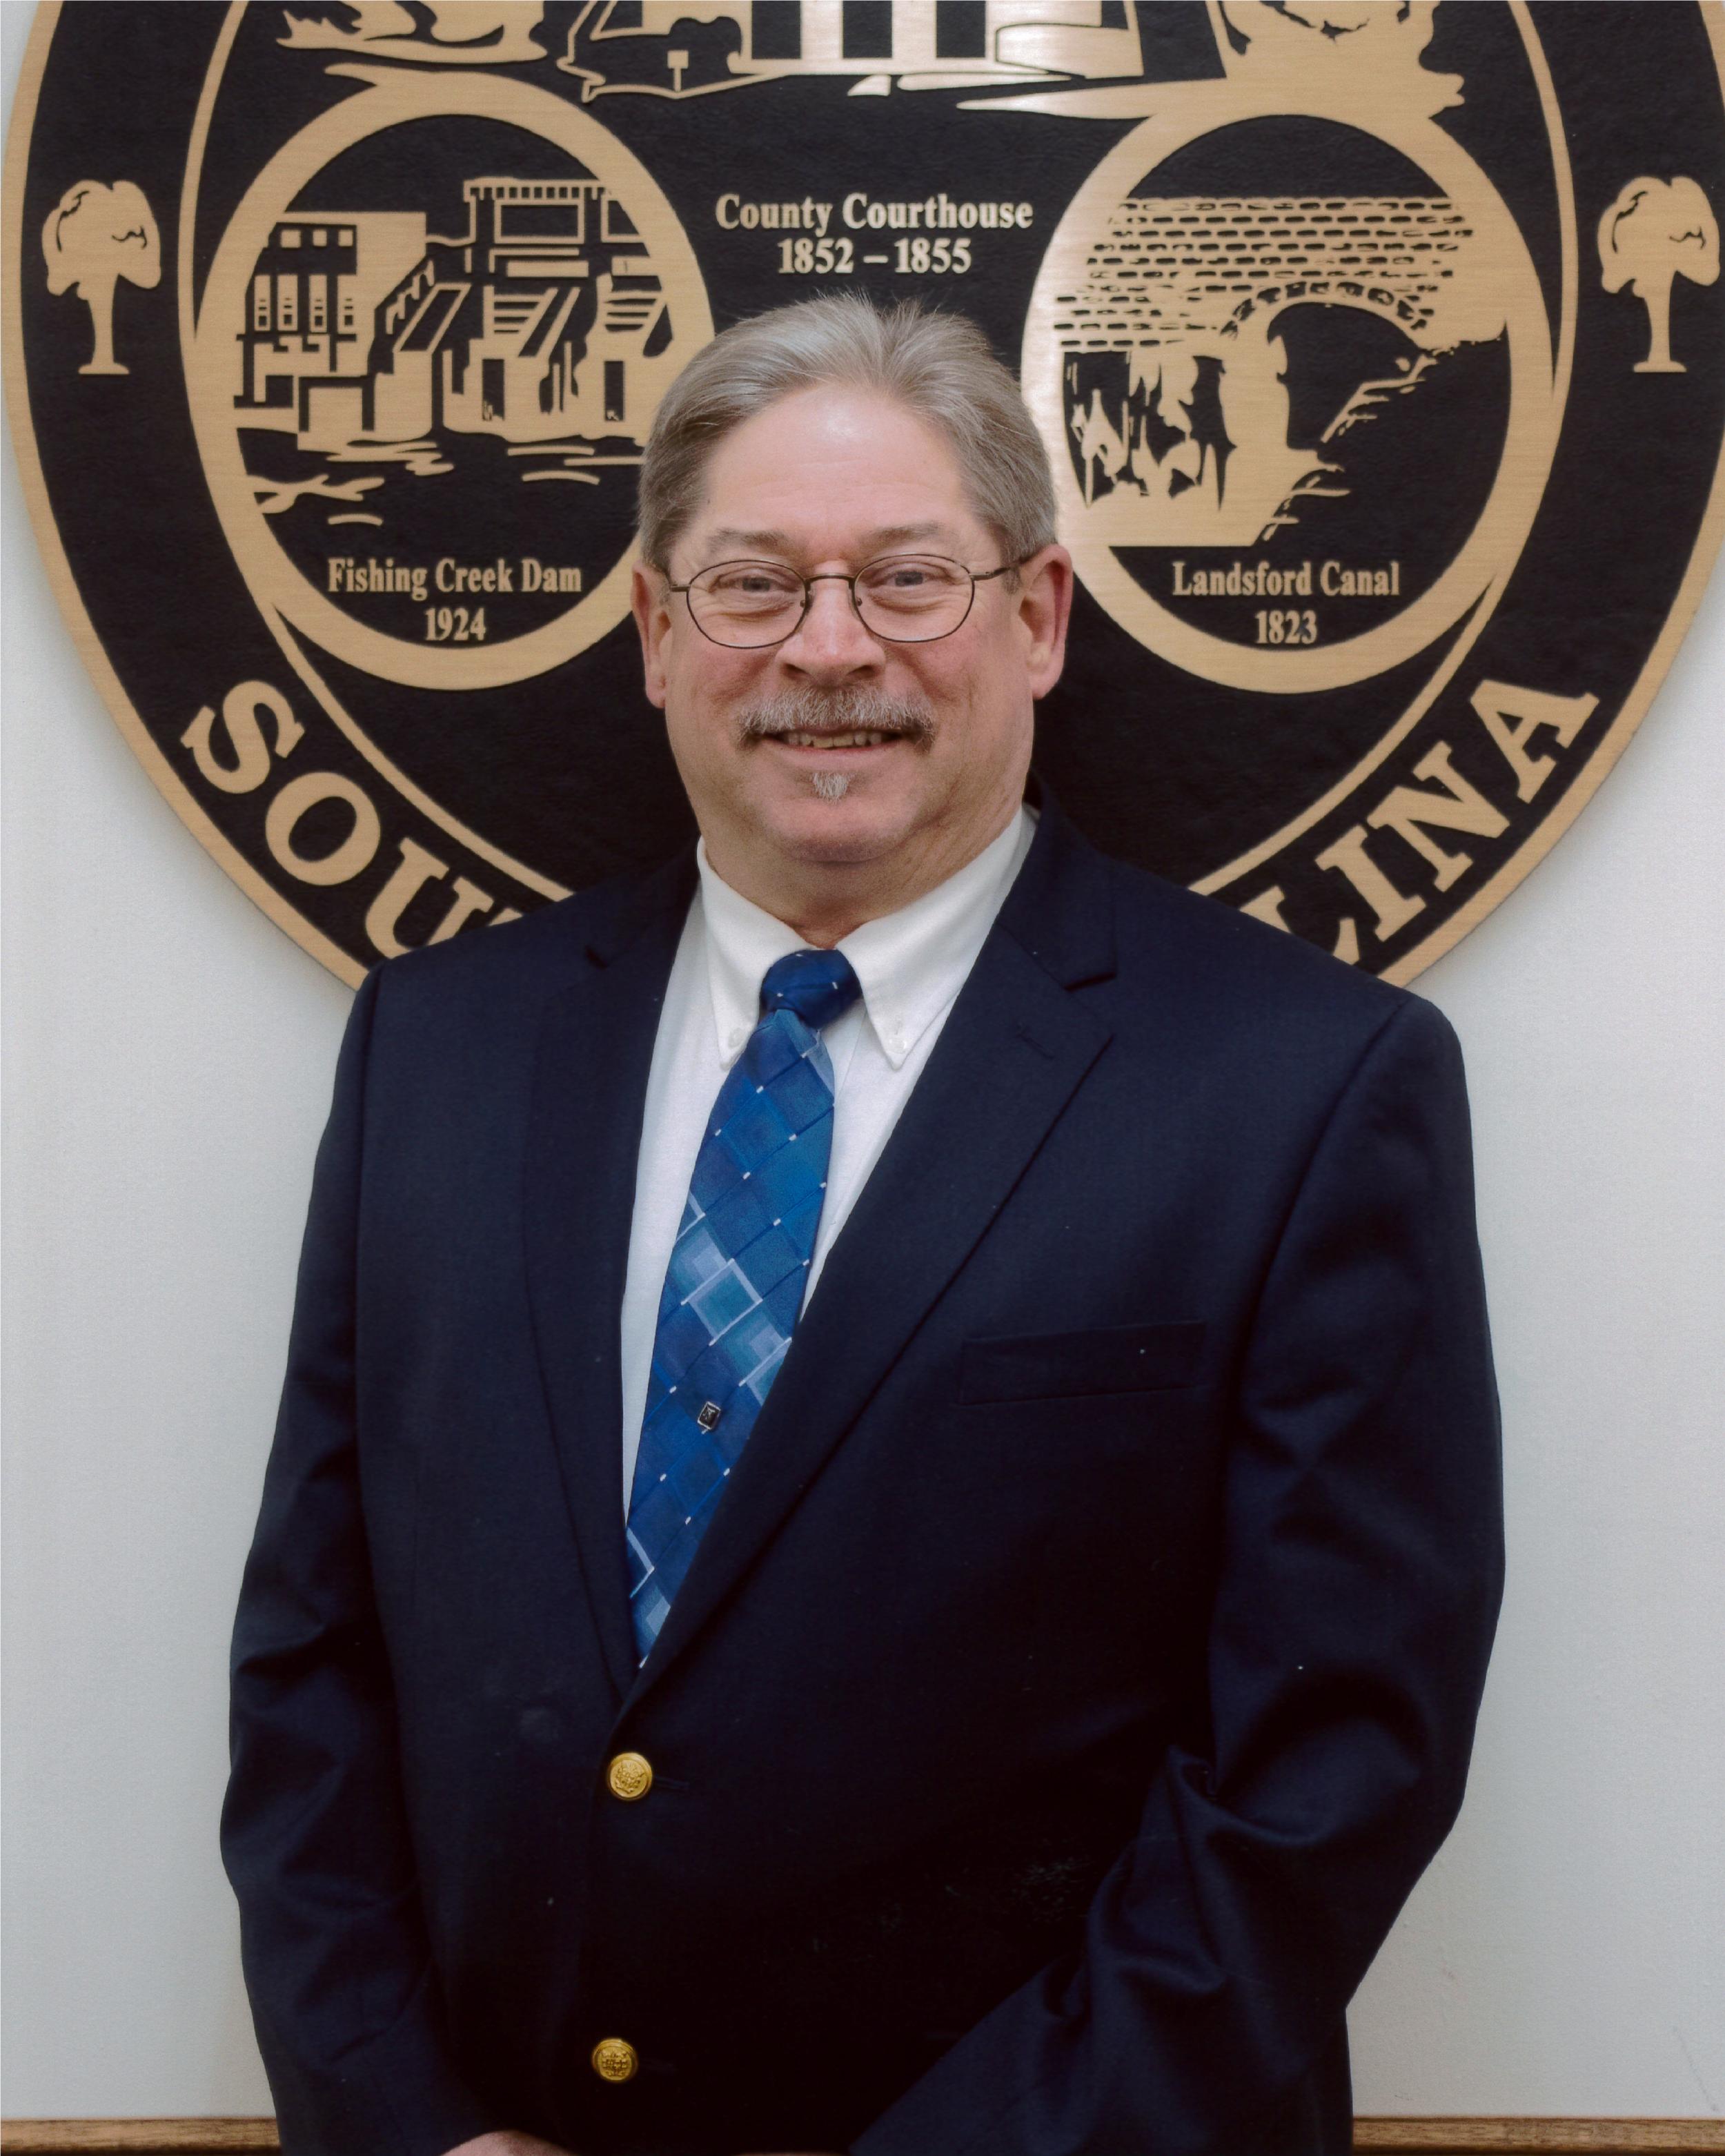 District 2 - Michael Vaughnmvaughn@ChesterCounty.org115 Chester AveGreat Falls, South Carolina 29055803-899-2206Term: January 2019 to December 2022